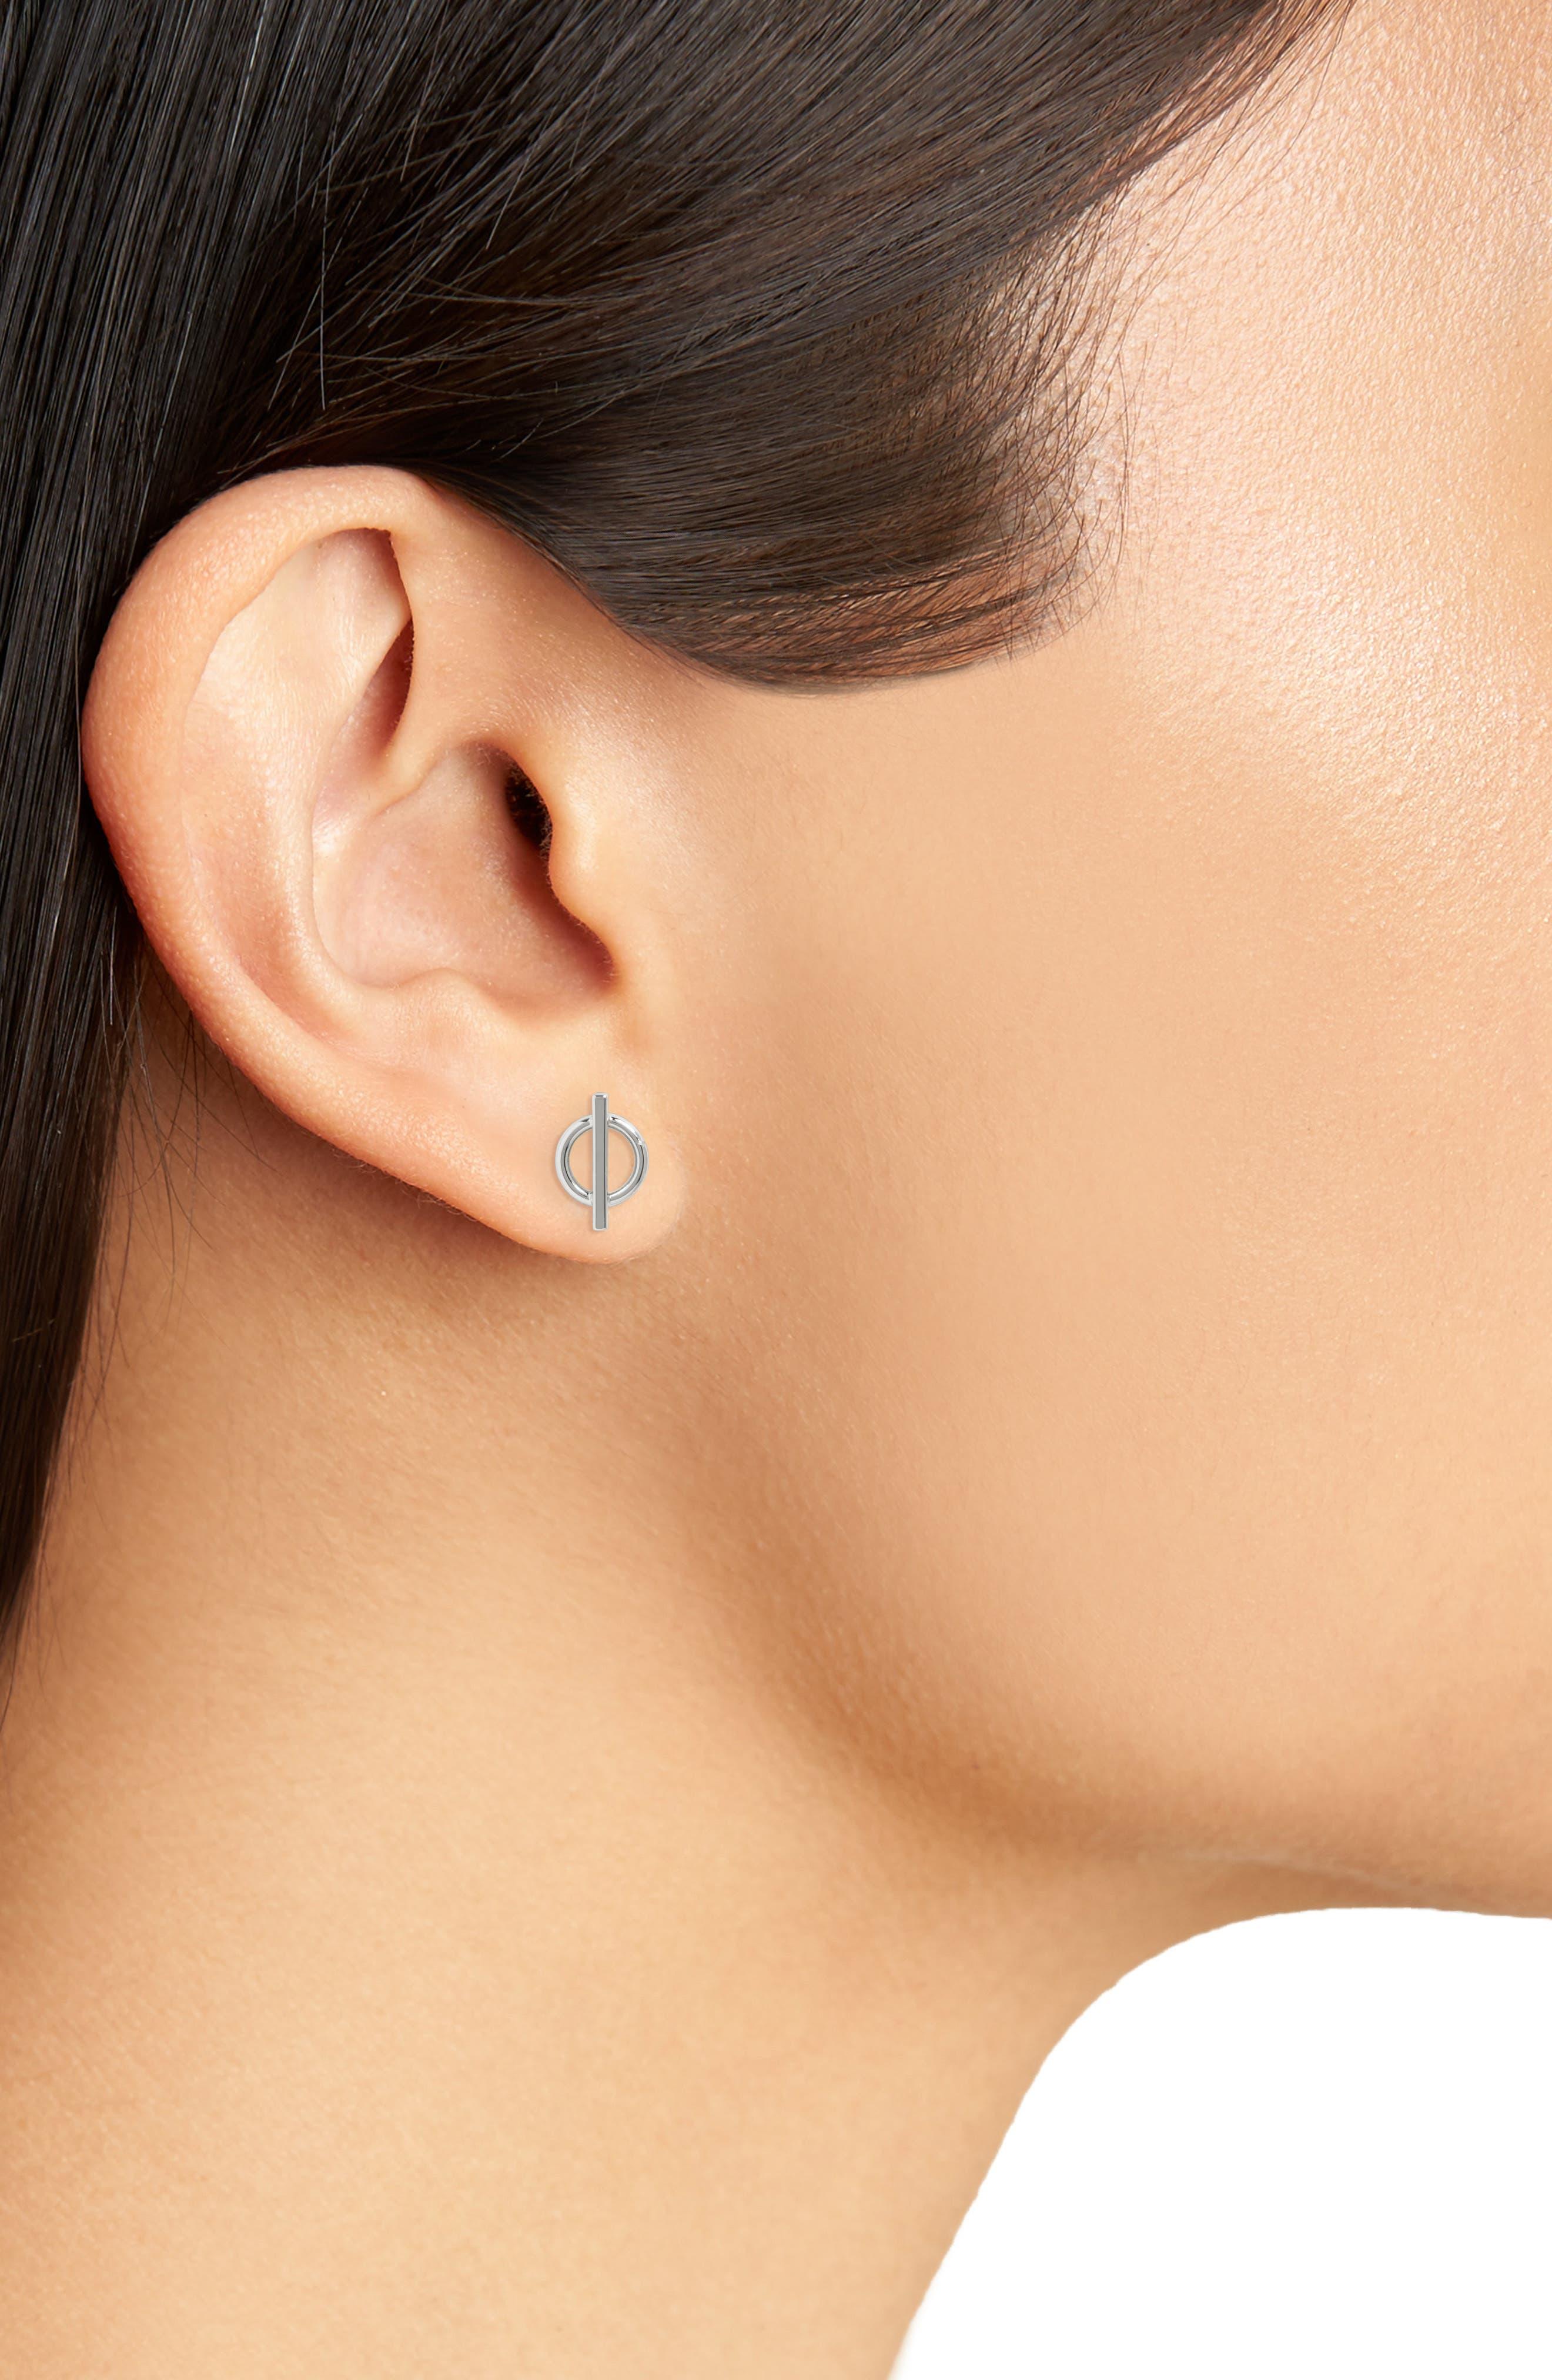 Set of 3 Stud Earrings,                             Alternate thumbnail 2, color,                             040